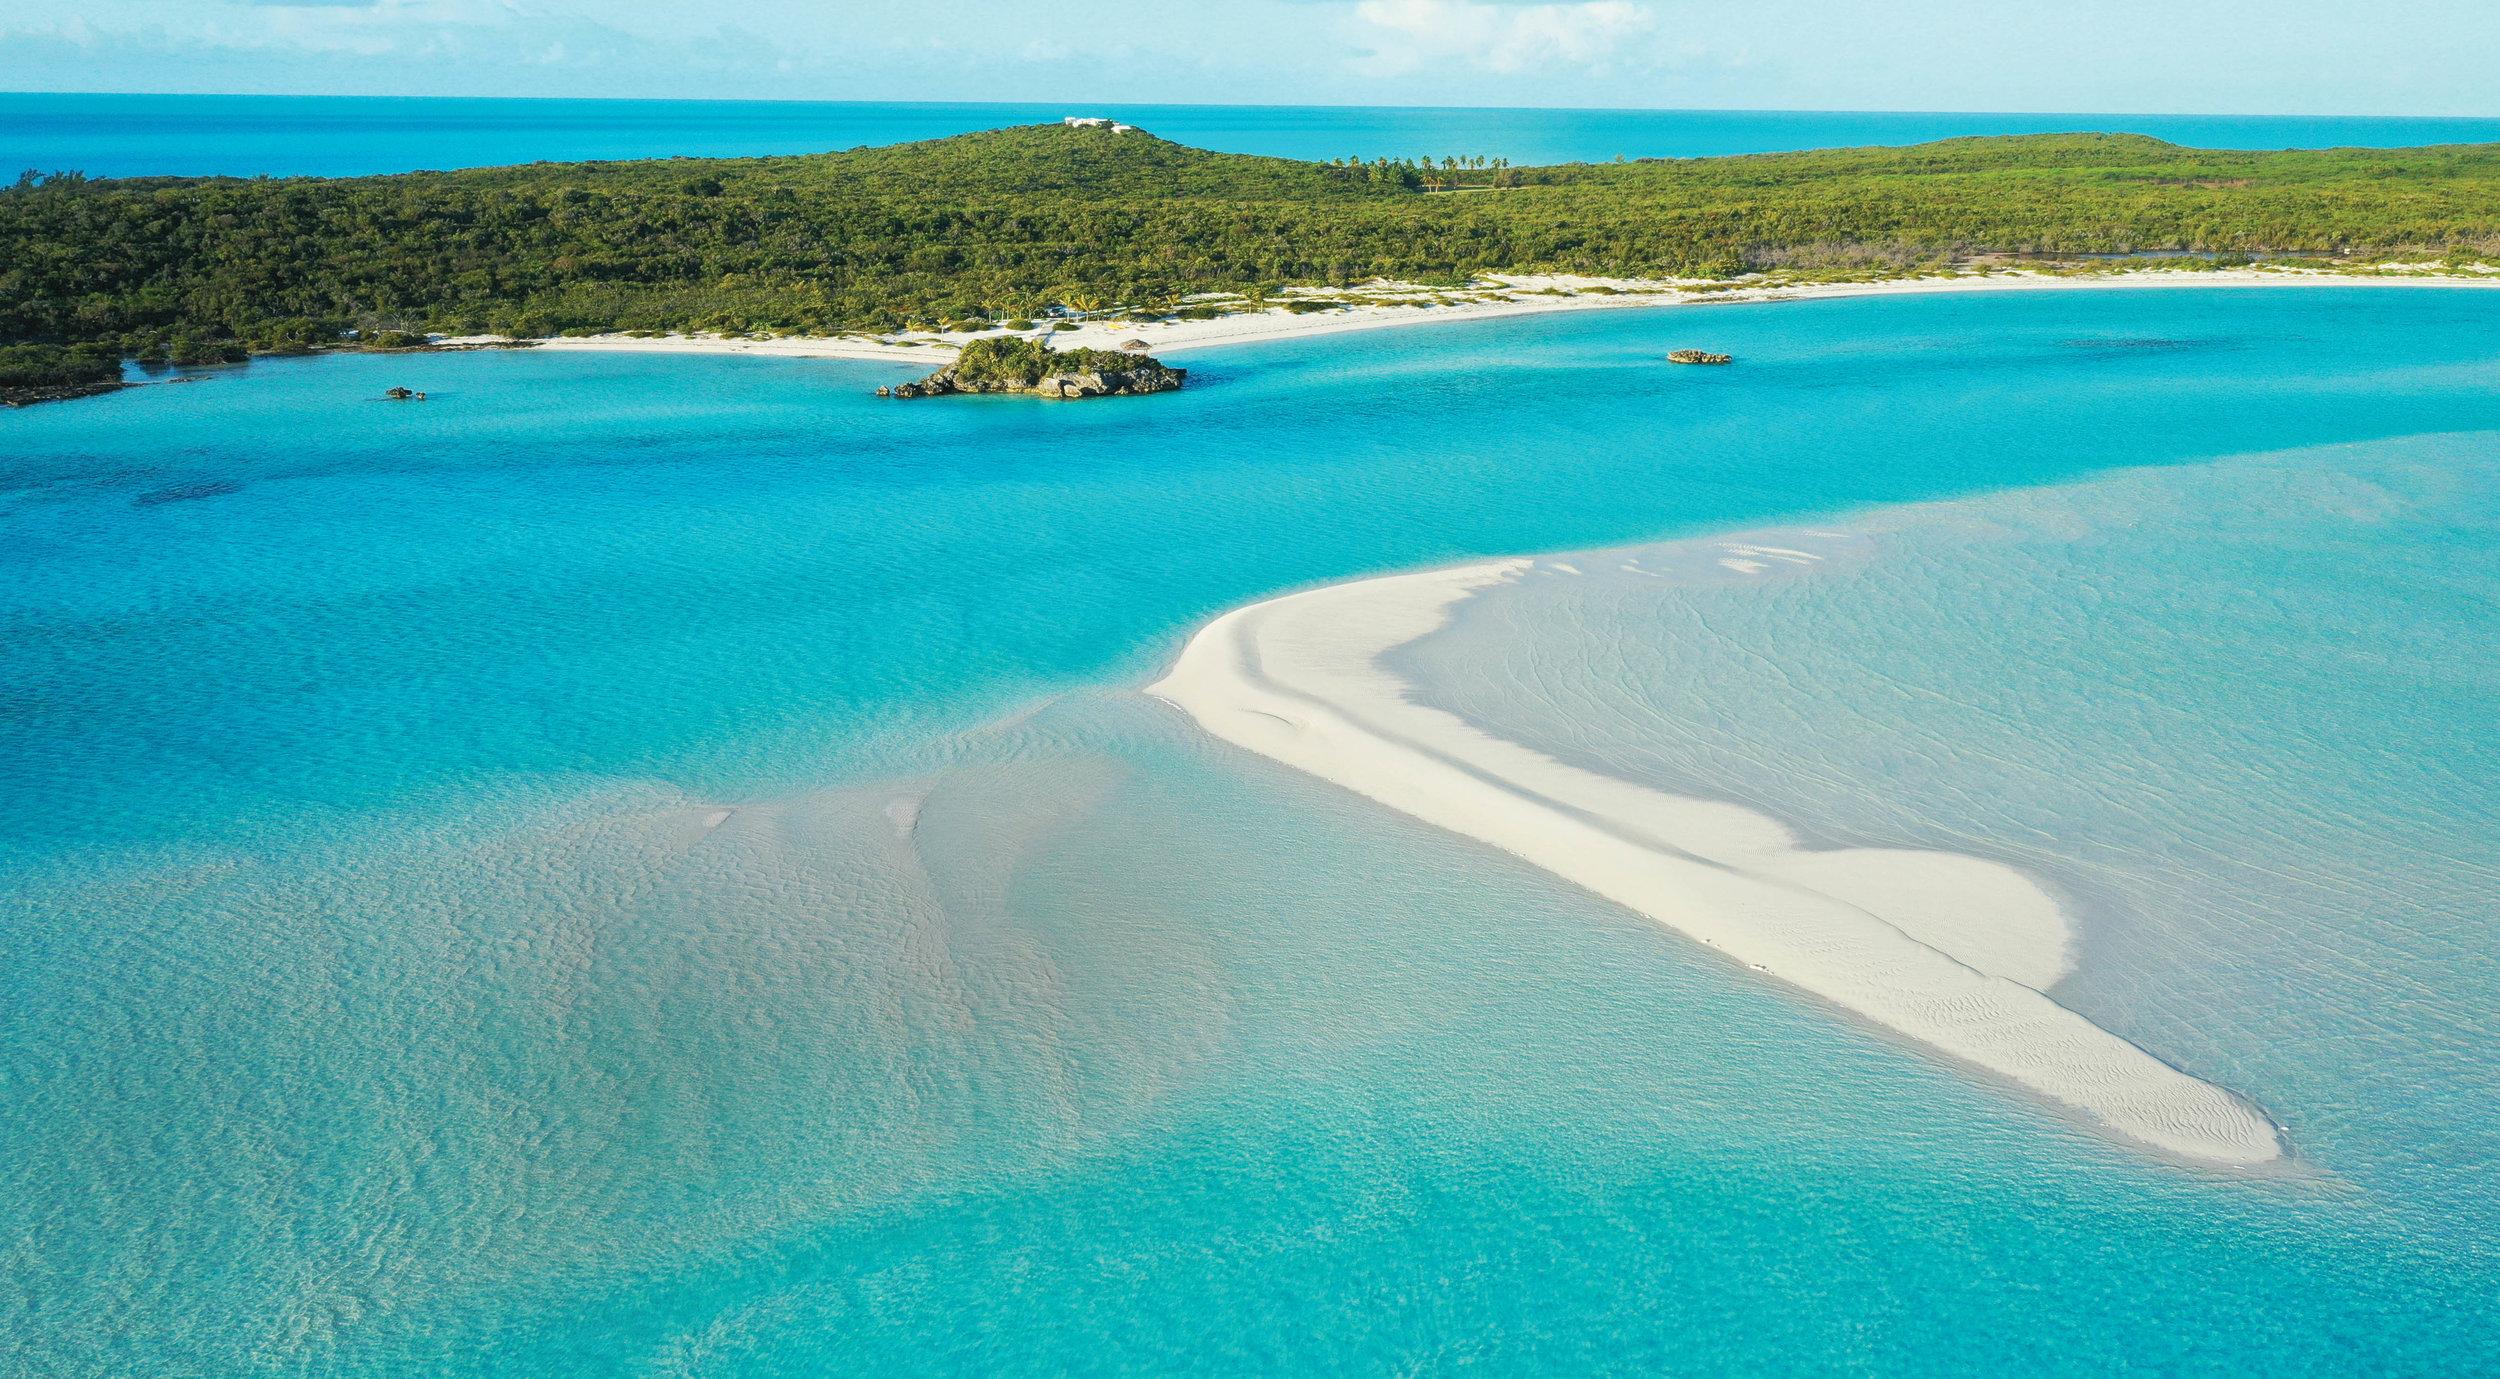 Blue Island | Exuma Cays, Bahamas